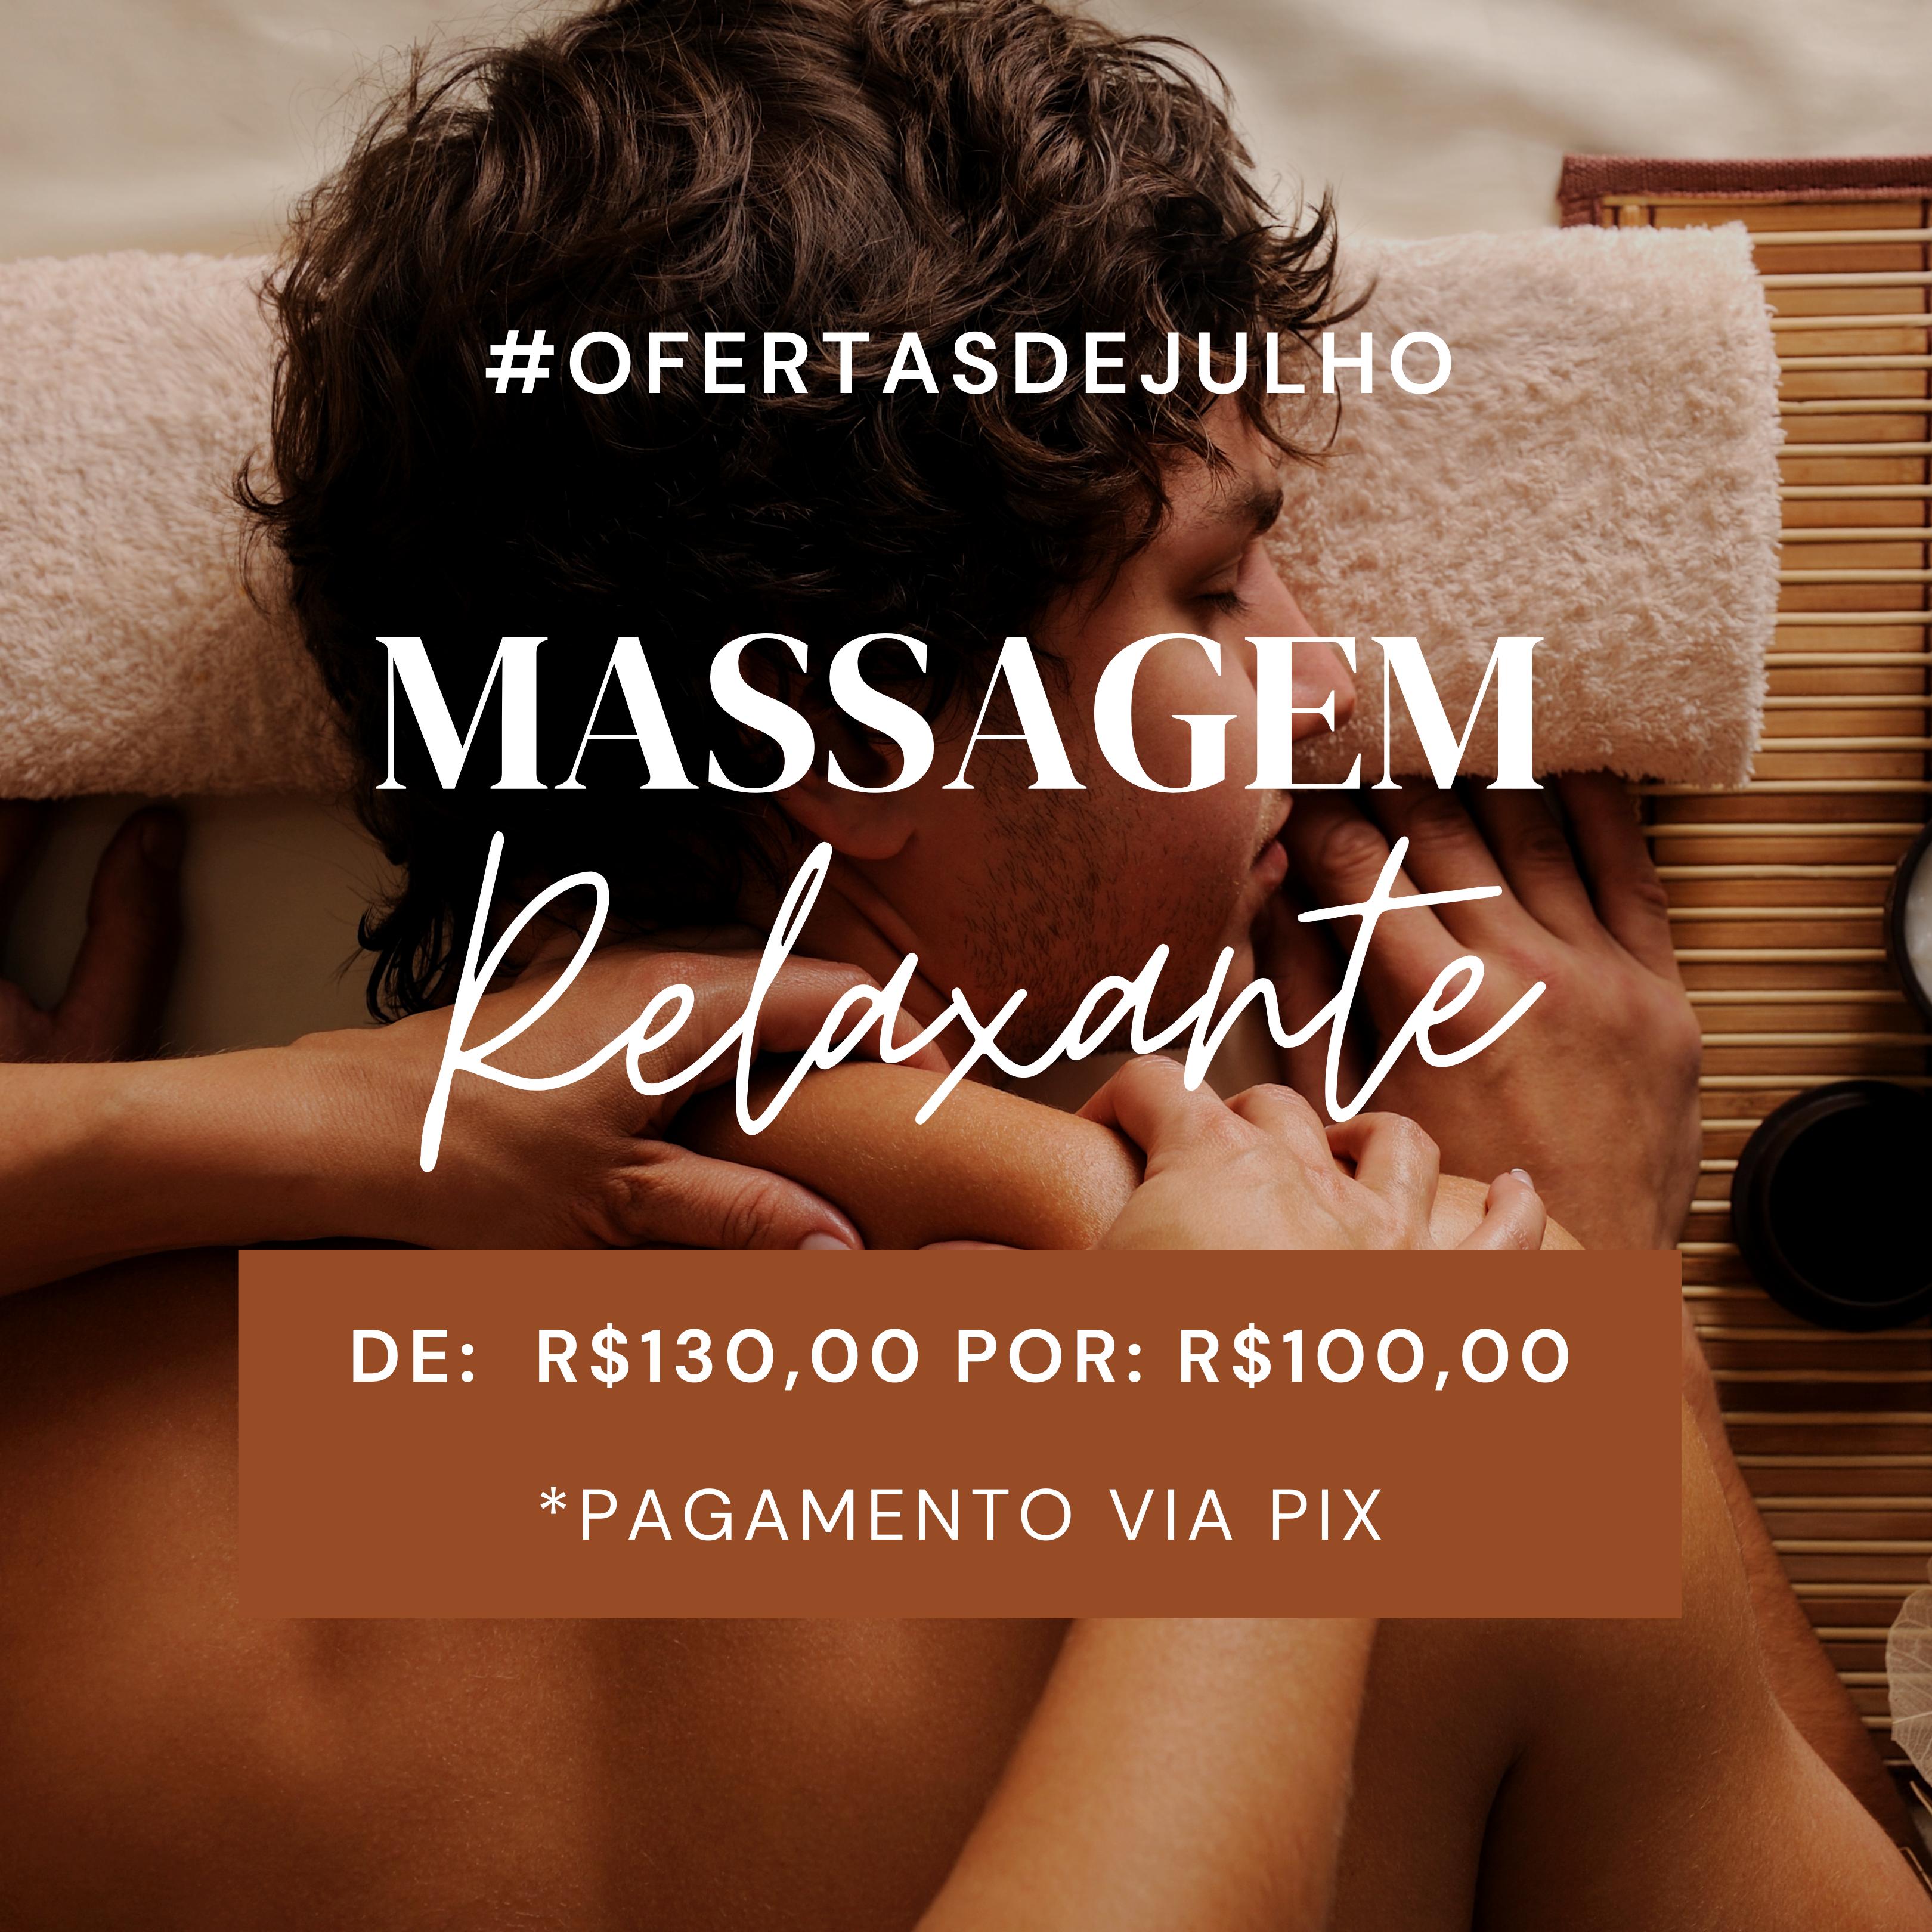 Massagem Relaxante, Valor Promocional!!